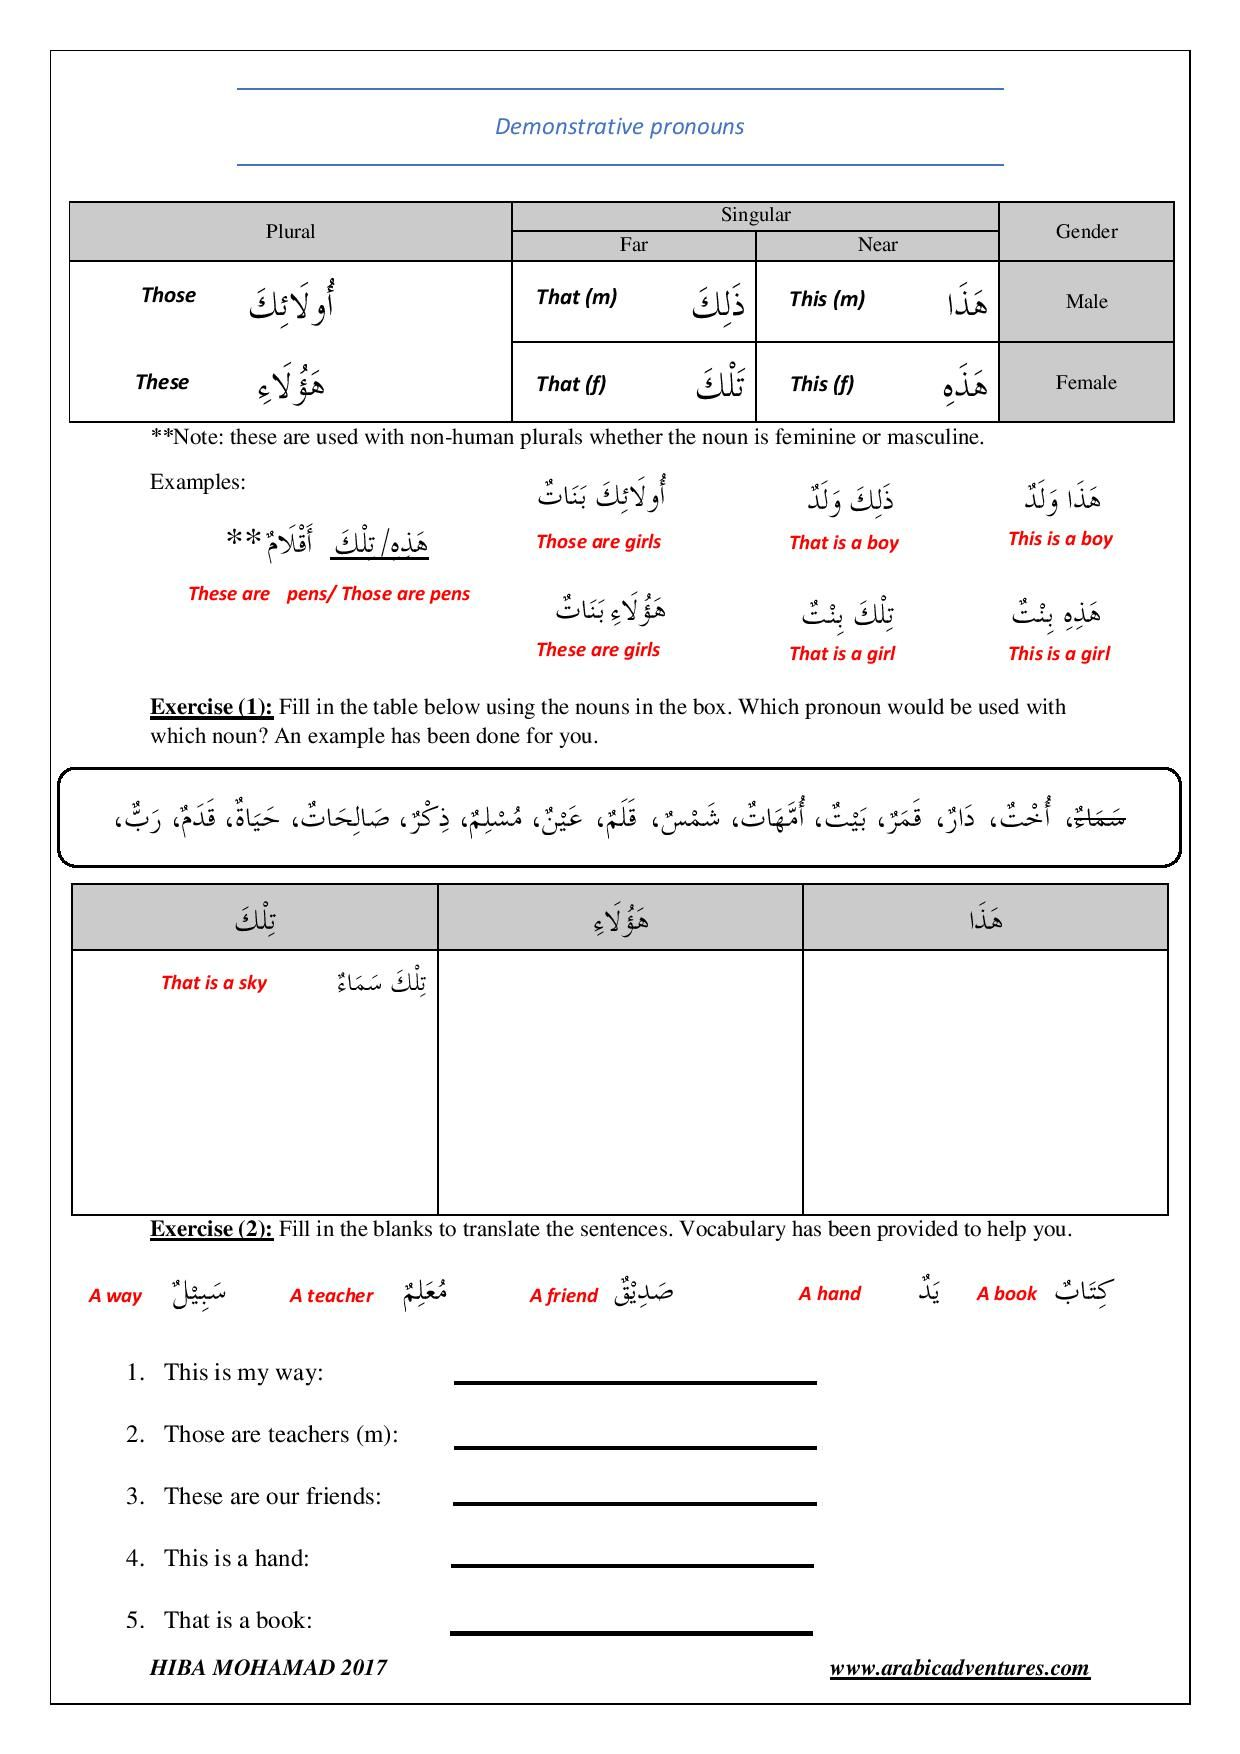 Arabic Demonstrative pronoun worksheet Free printable at – Demonstrative Pronouns Worksheet